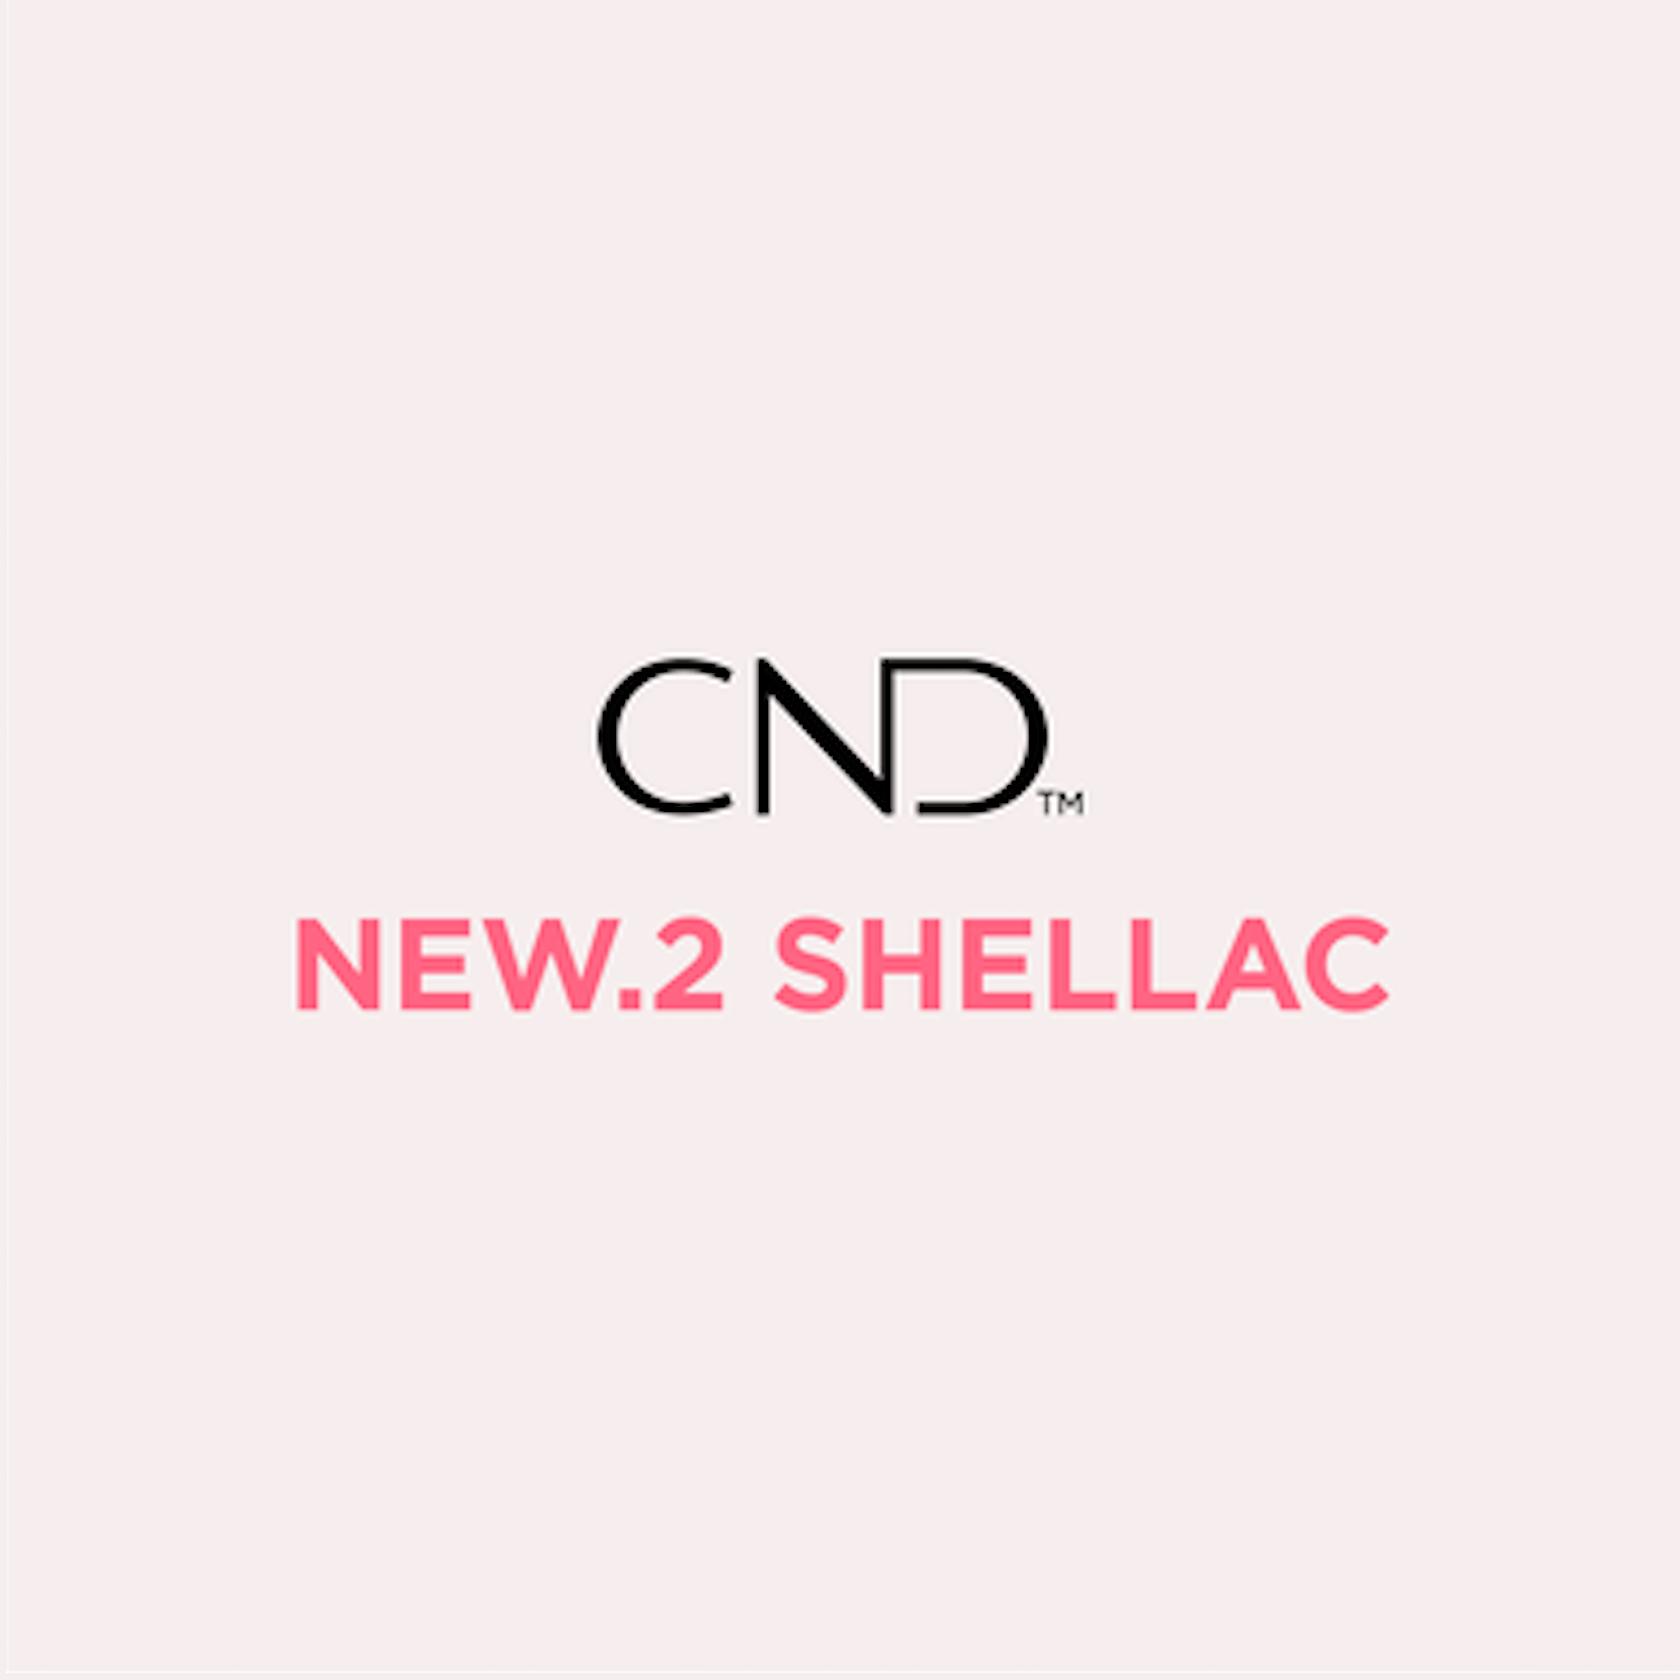 NEW.2 SHELLAC